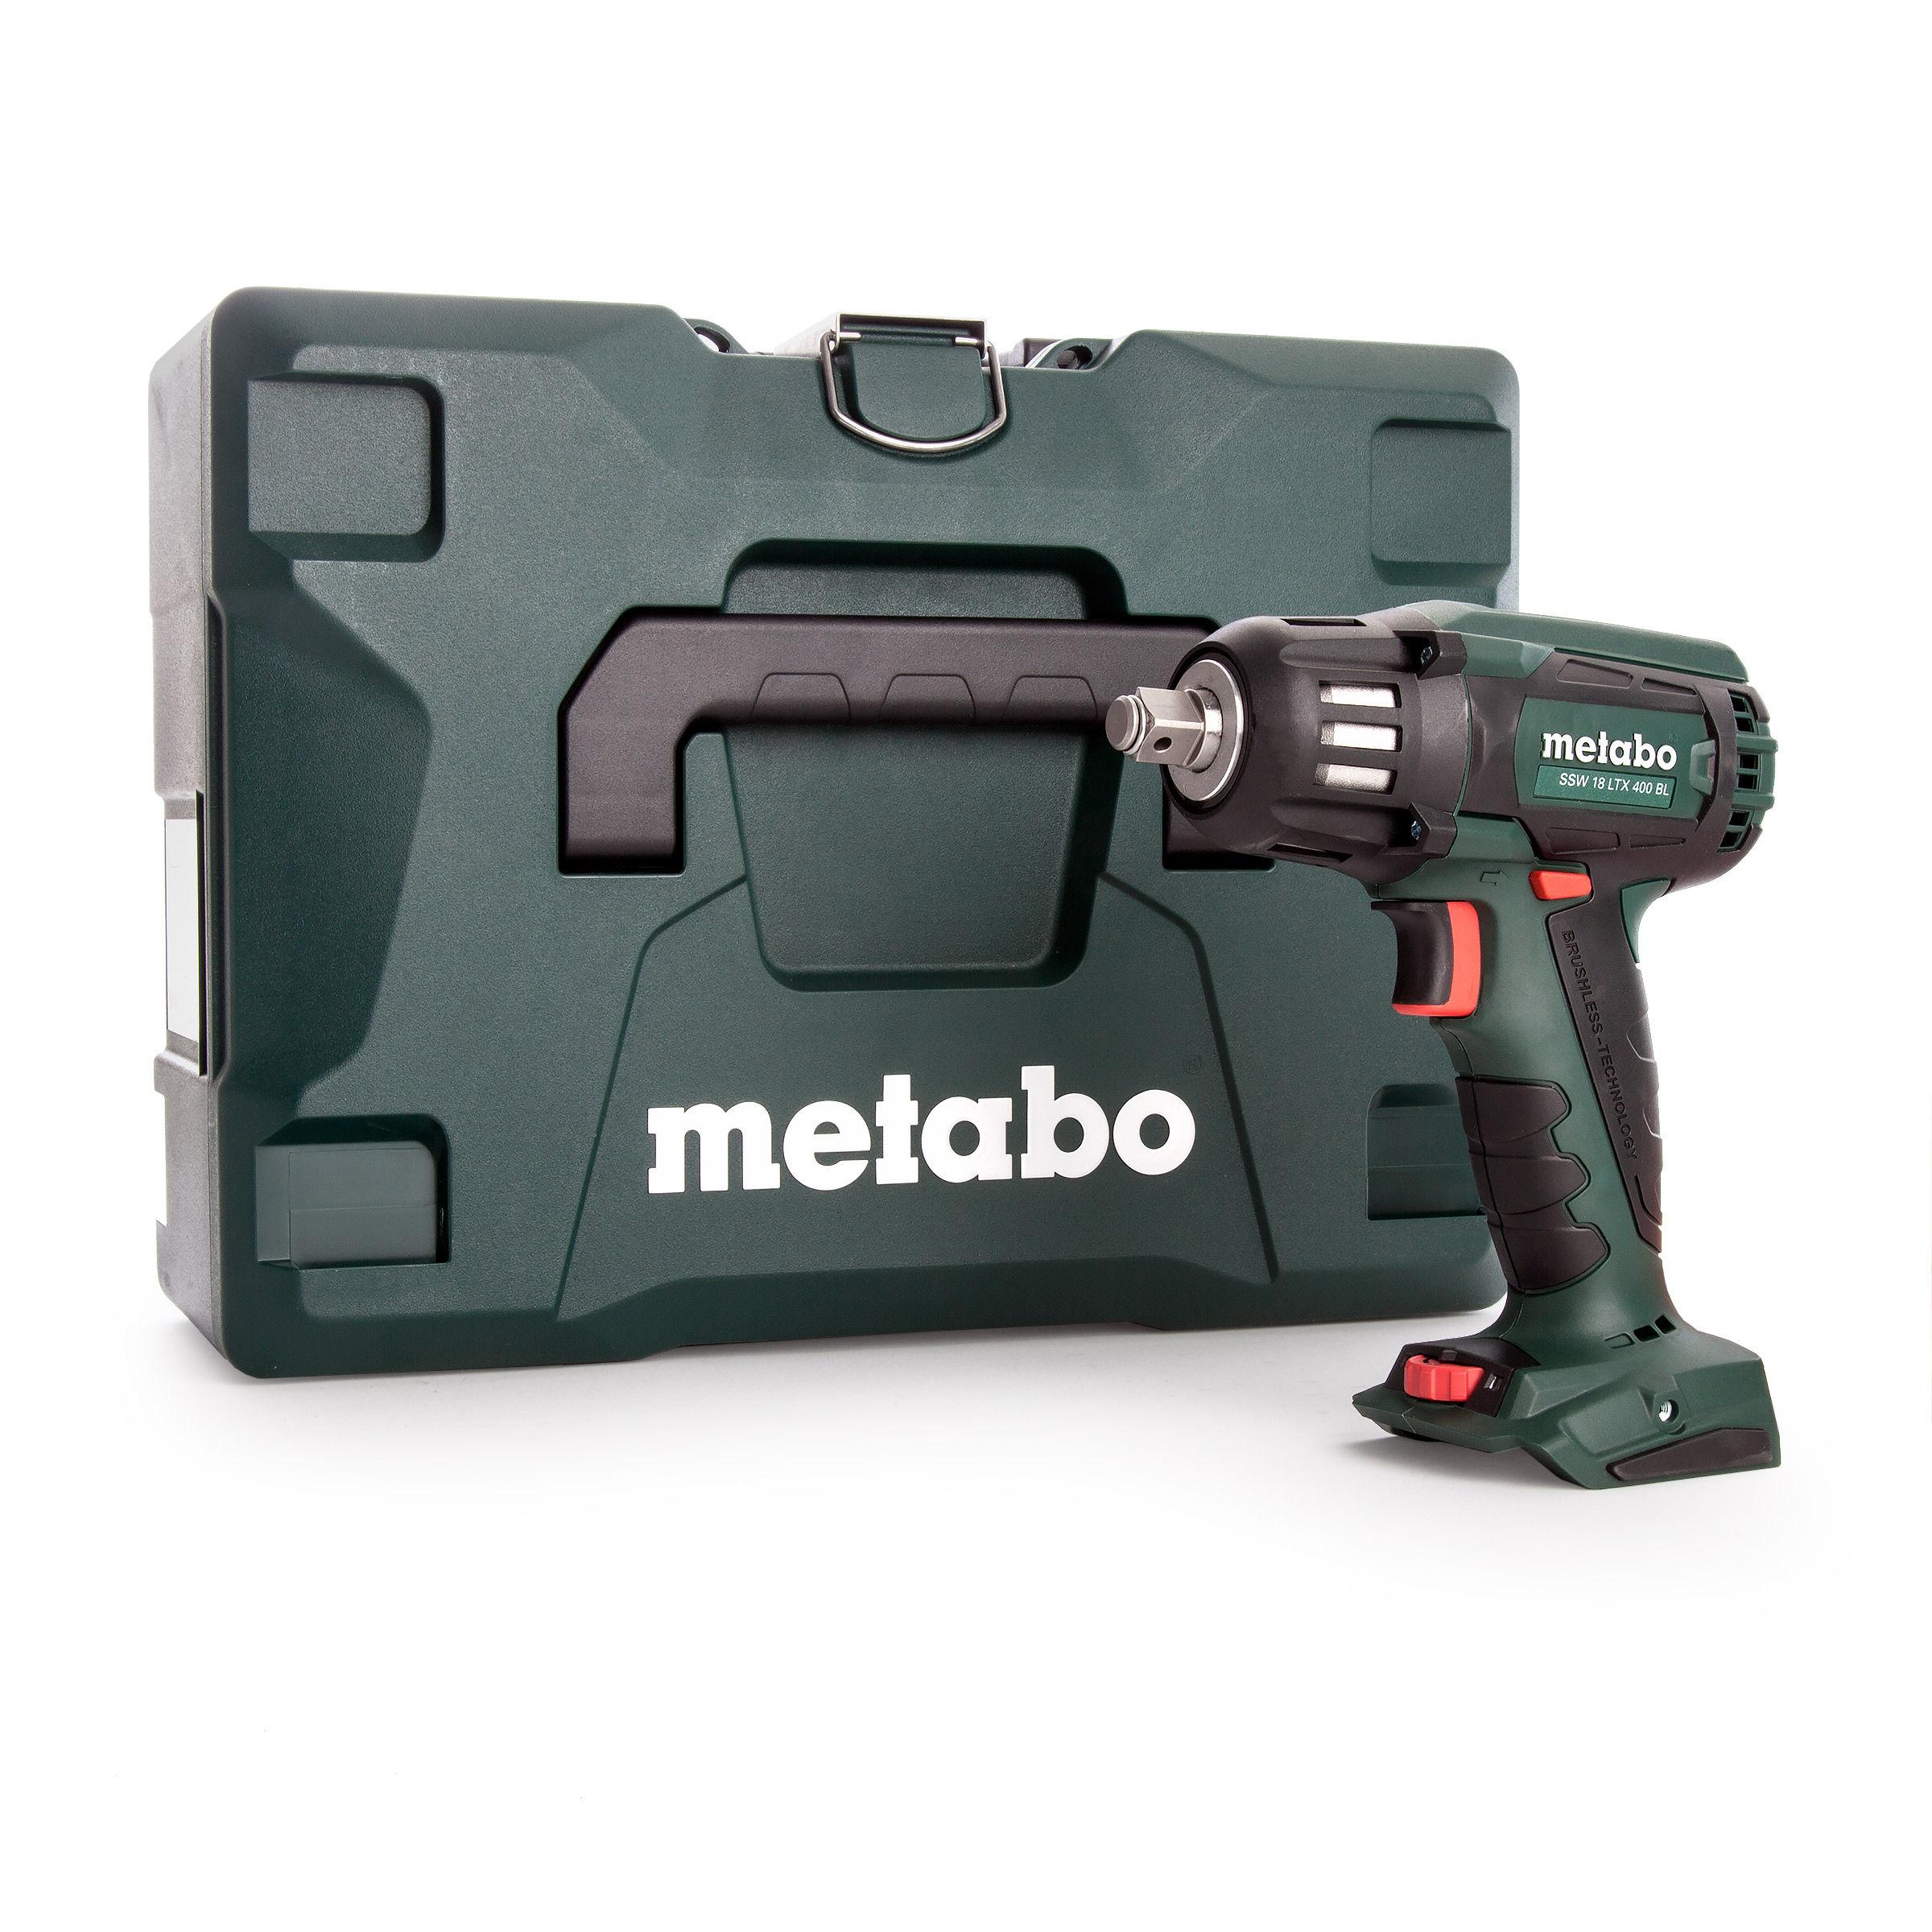 toolstop metabo ssw 18 ltx 400 bl high torque impact. Black Bedroom Furniture Sets. Home Design Ideas